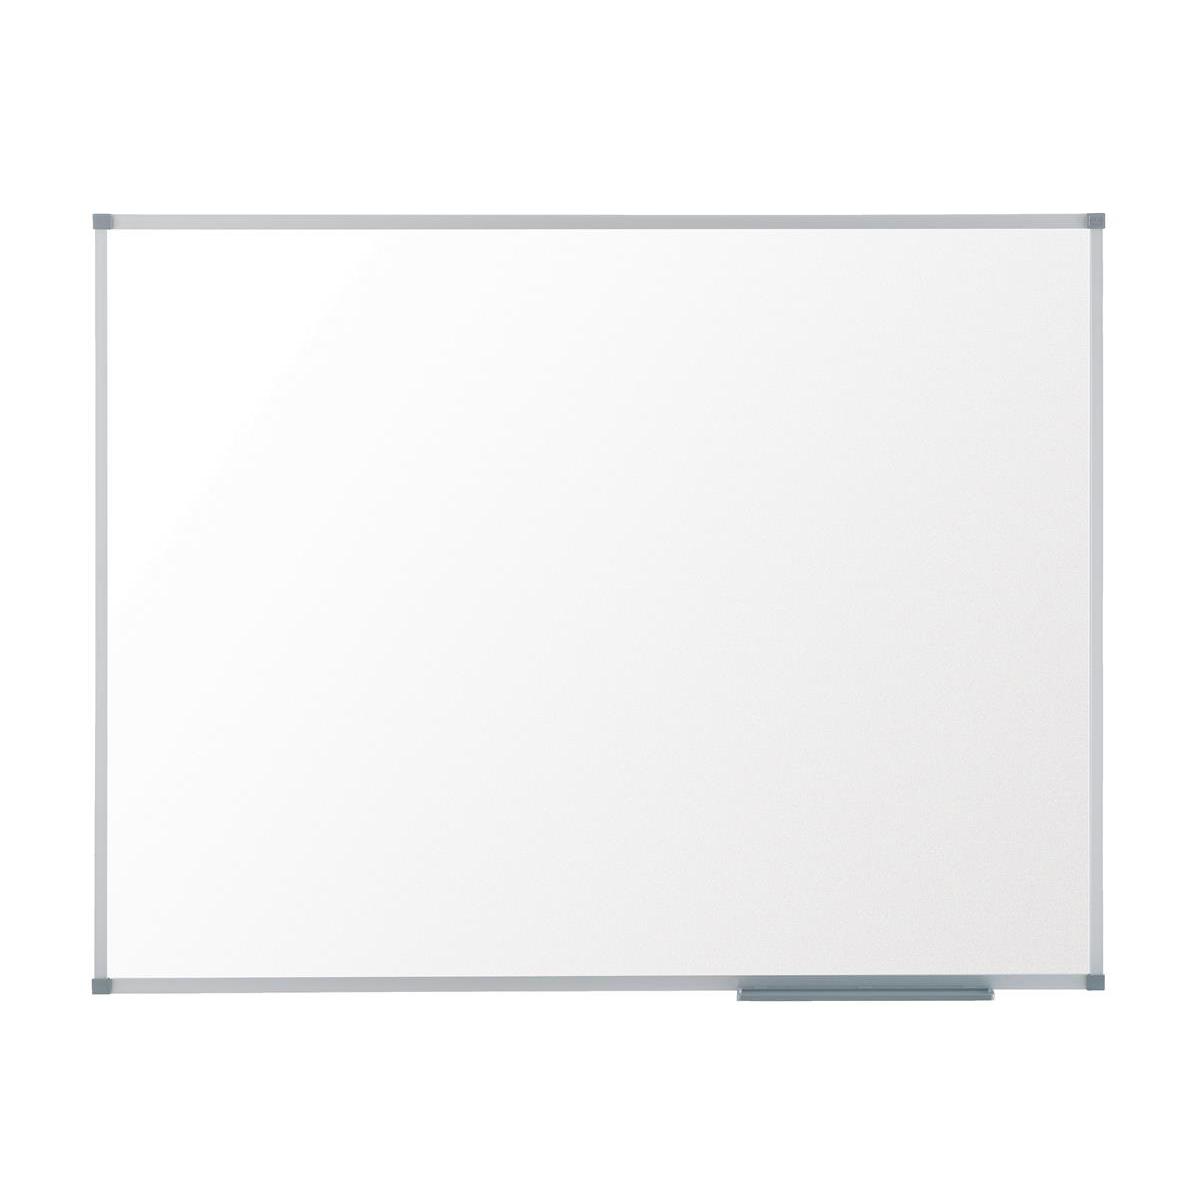 Nobo Basic Whiteboard Melamine Surface Non-magnetic Aluminium Trim W1500xH1000mm White Ref 1905204